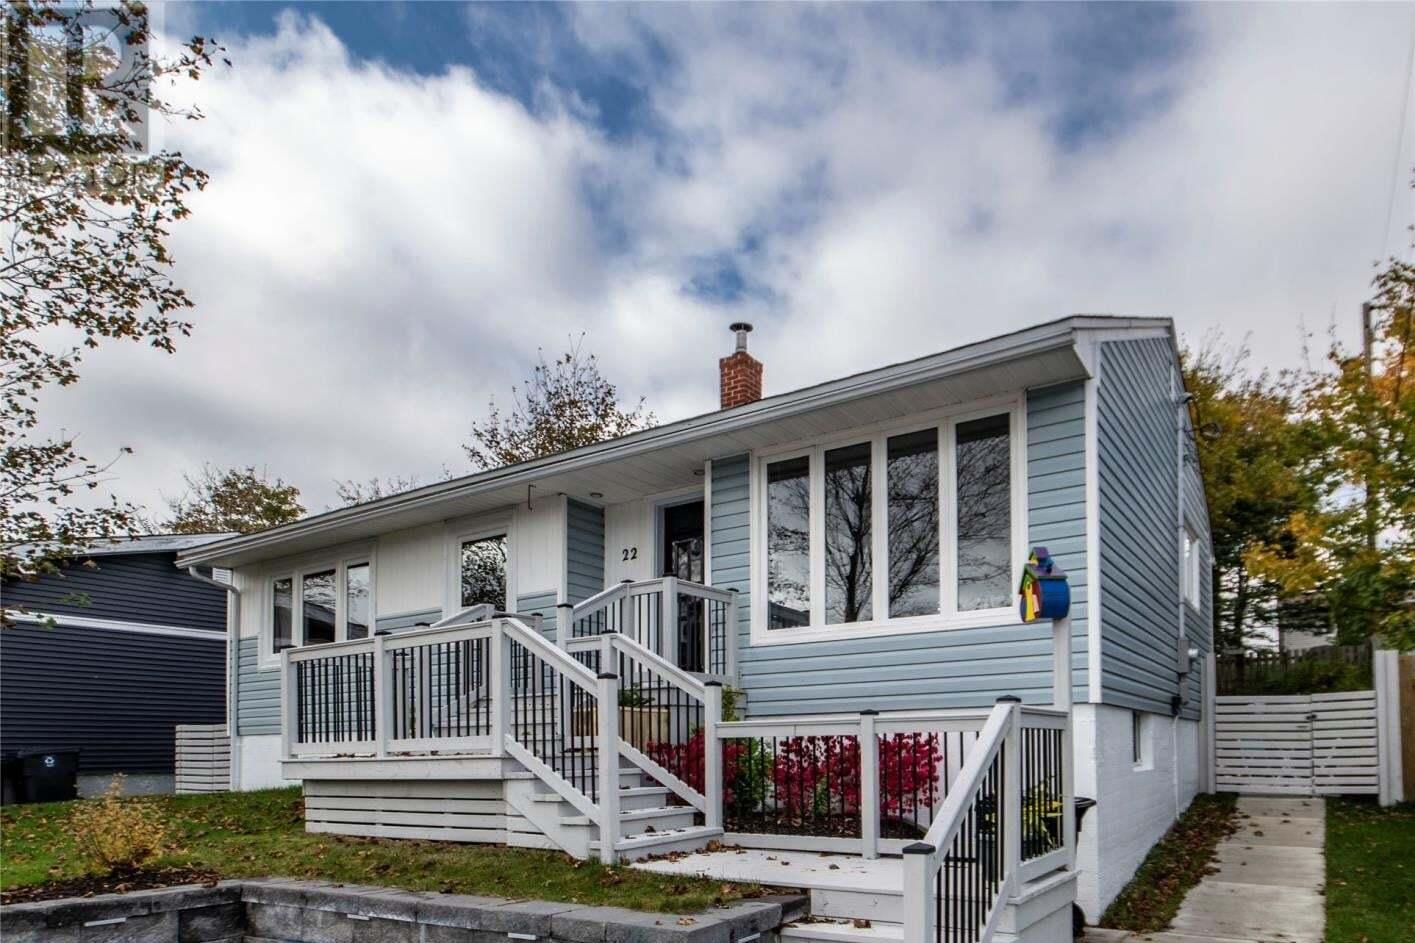 House for sale at 22 Gleneyre St St. John's Newfoundland - MLS: 1222608